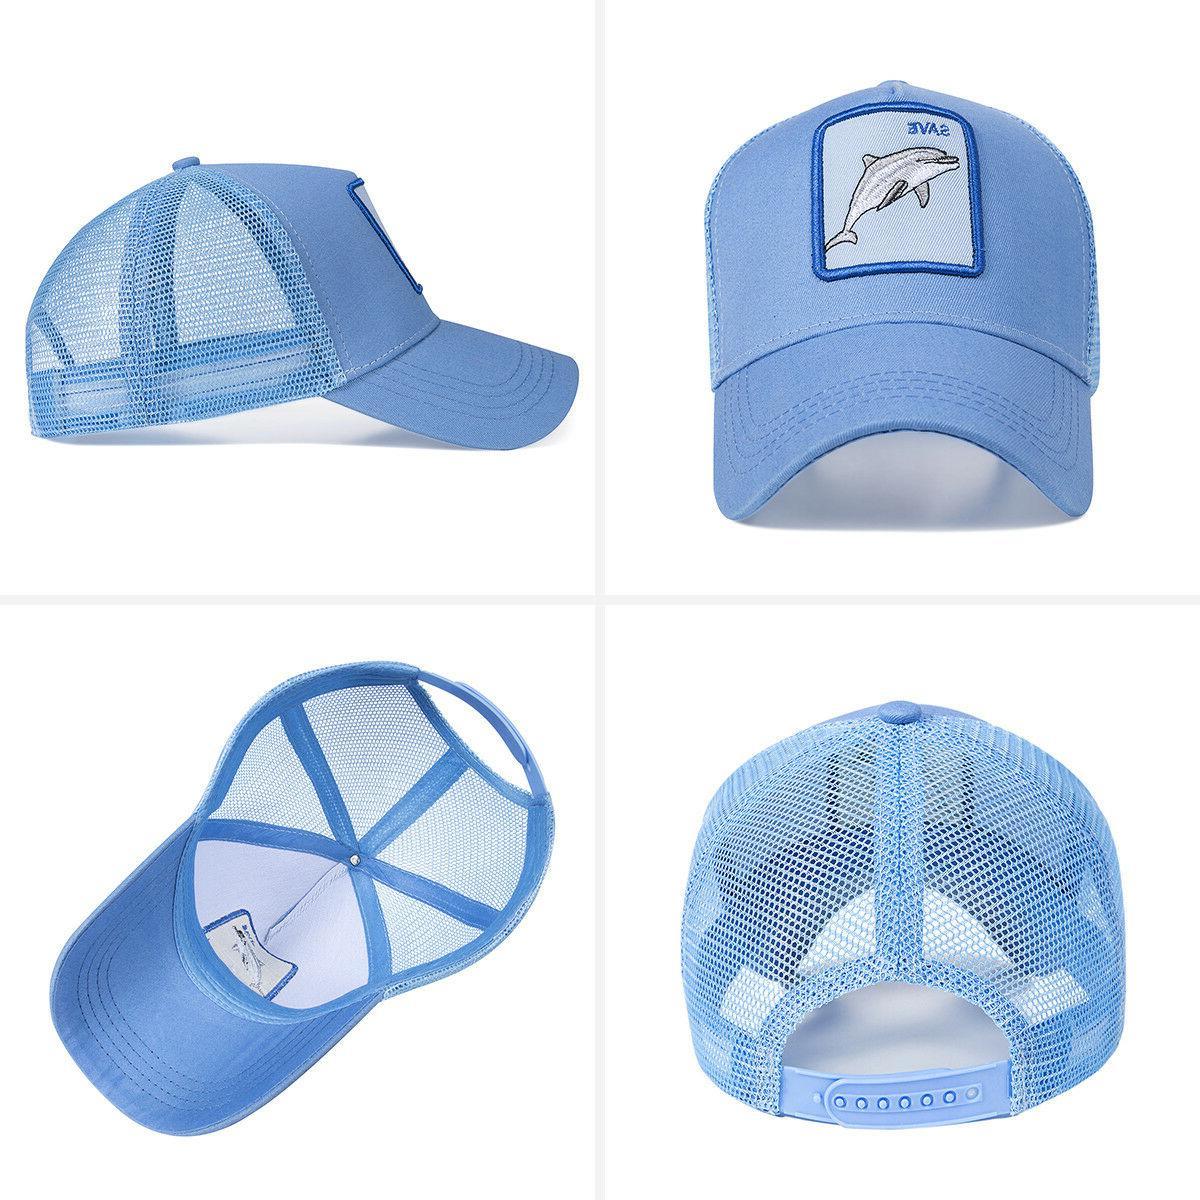 Personality Embroidery Fashion Hats Unisex